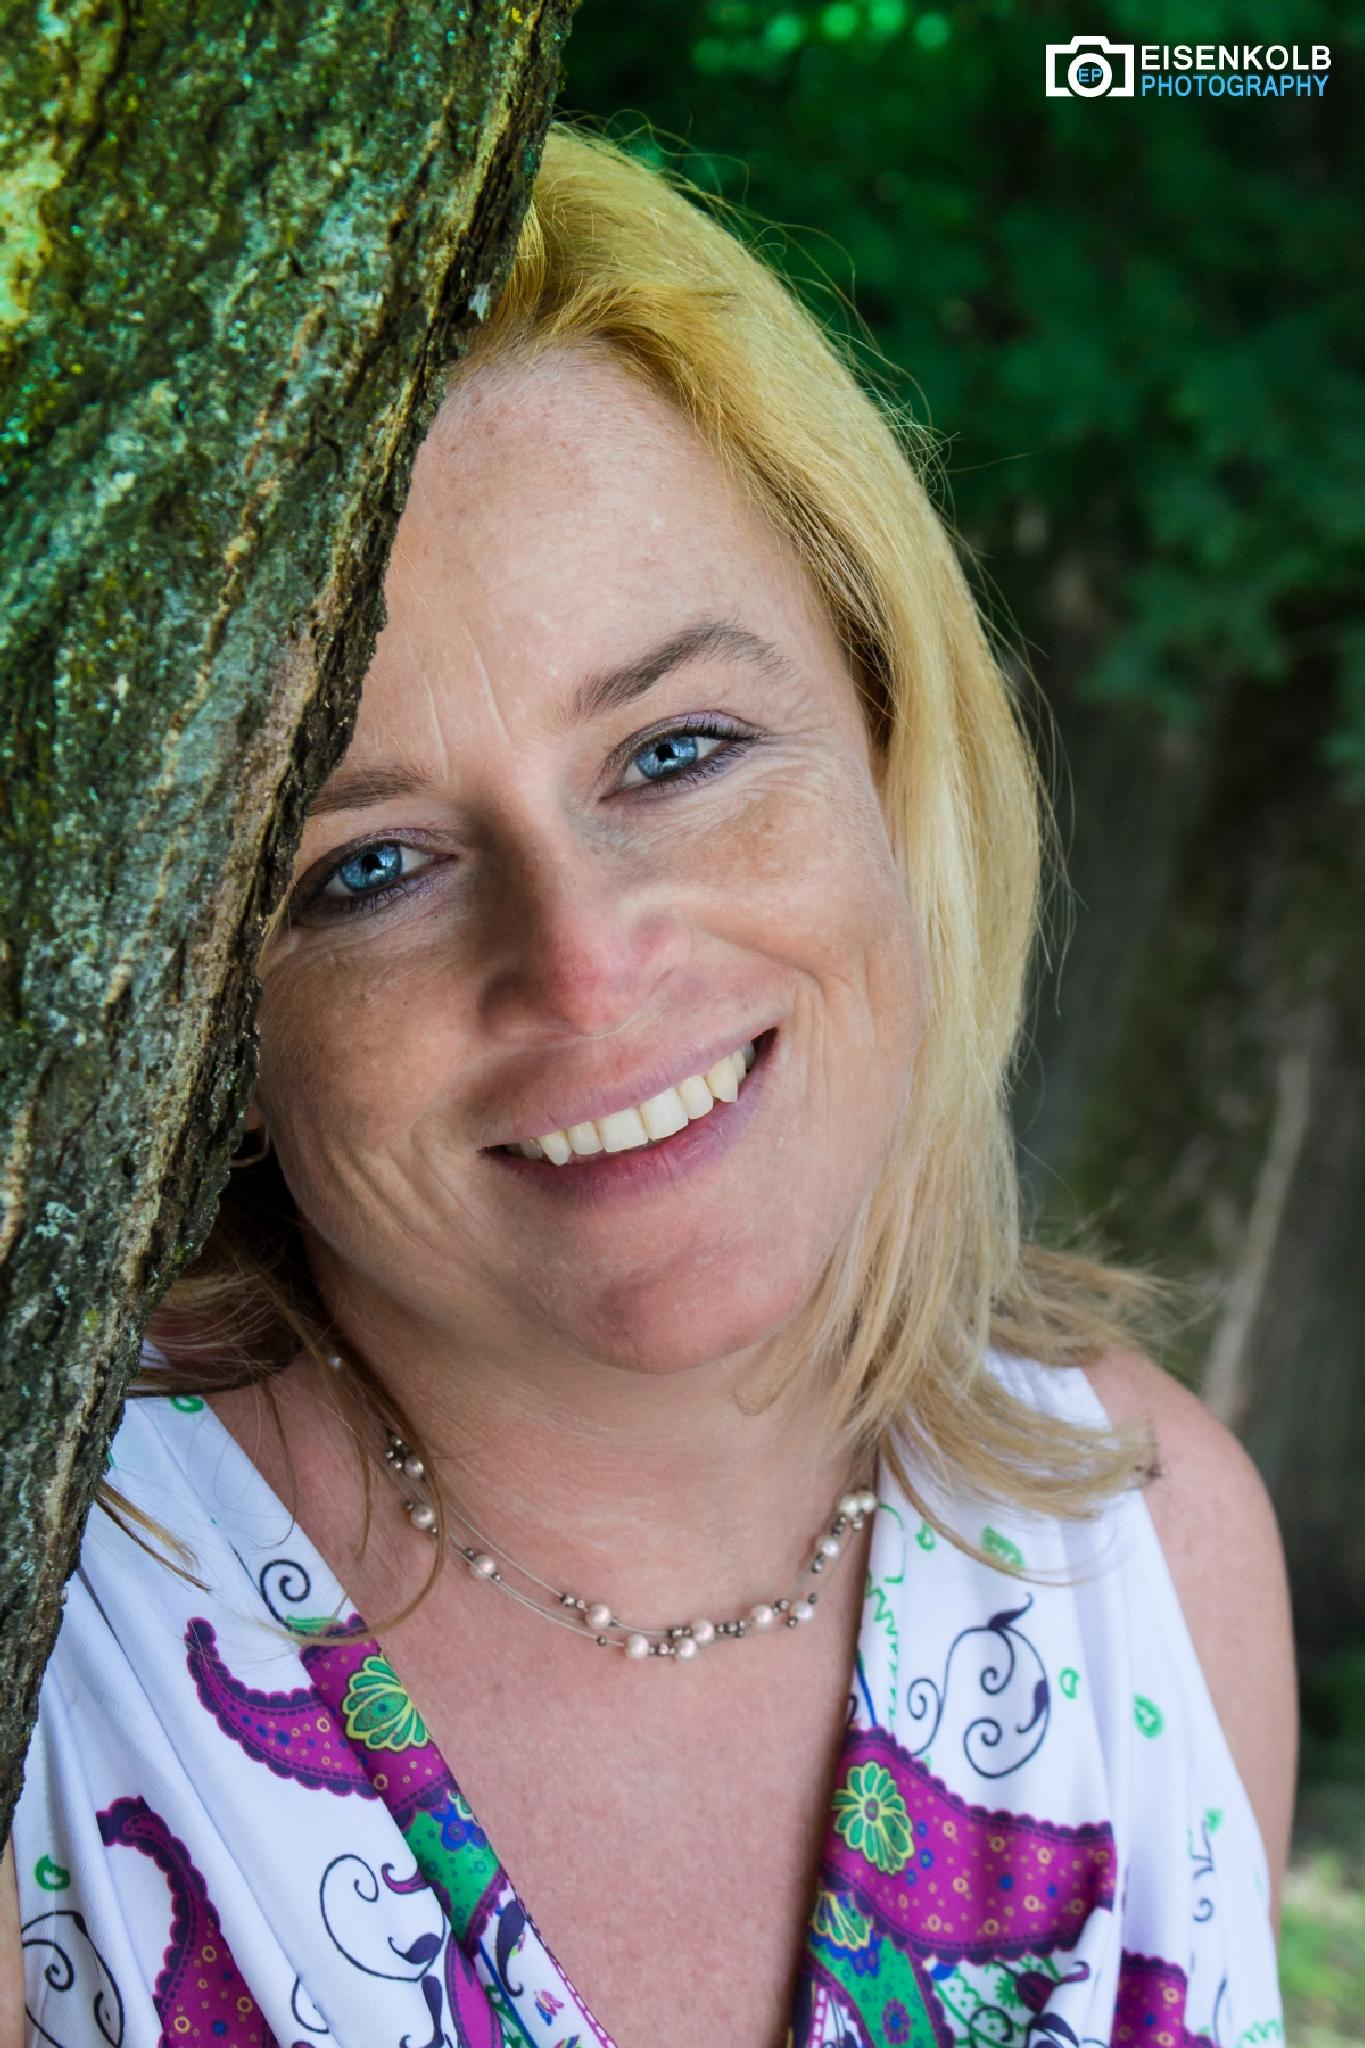 Susanne #3 (June 2015) by EisenkolbPhotography